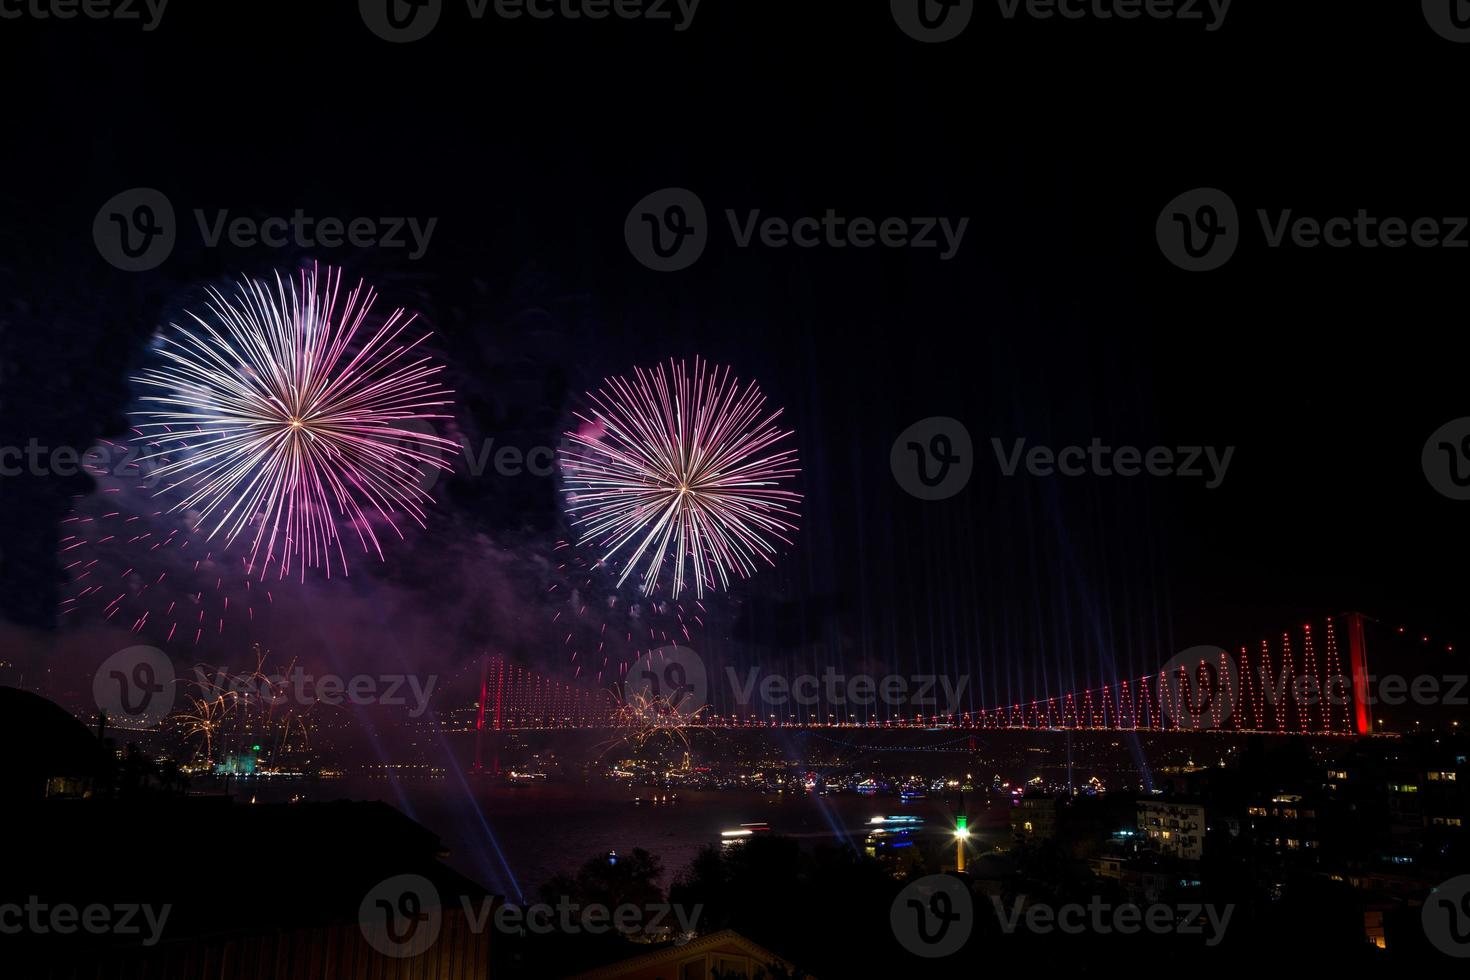 fyrverkerier över bron i istanbul, Turkiet foto